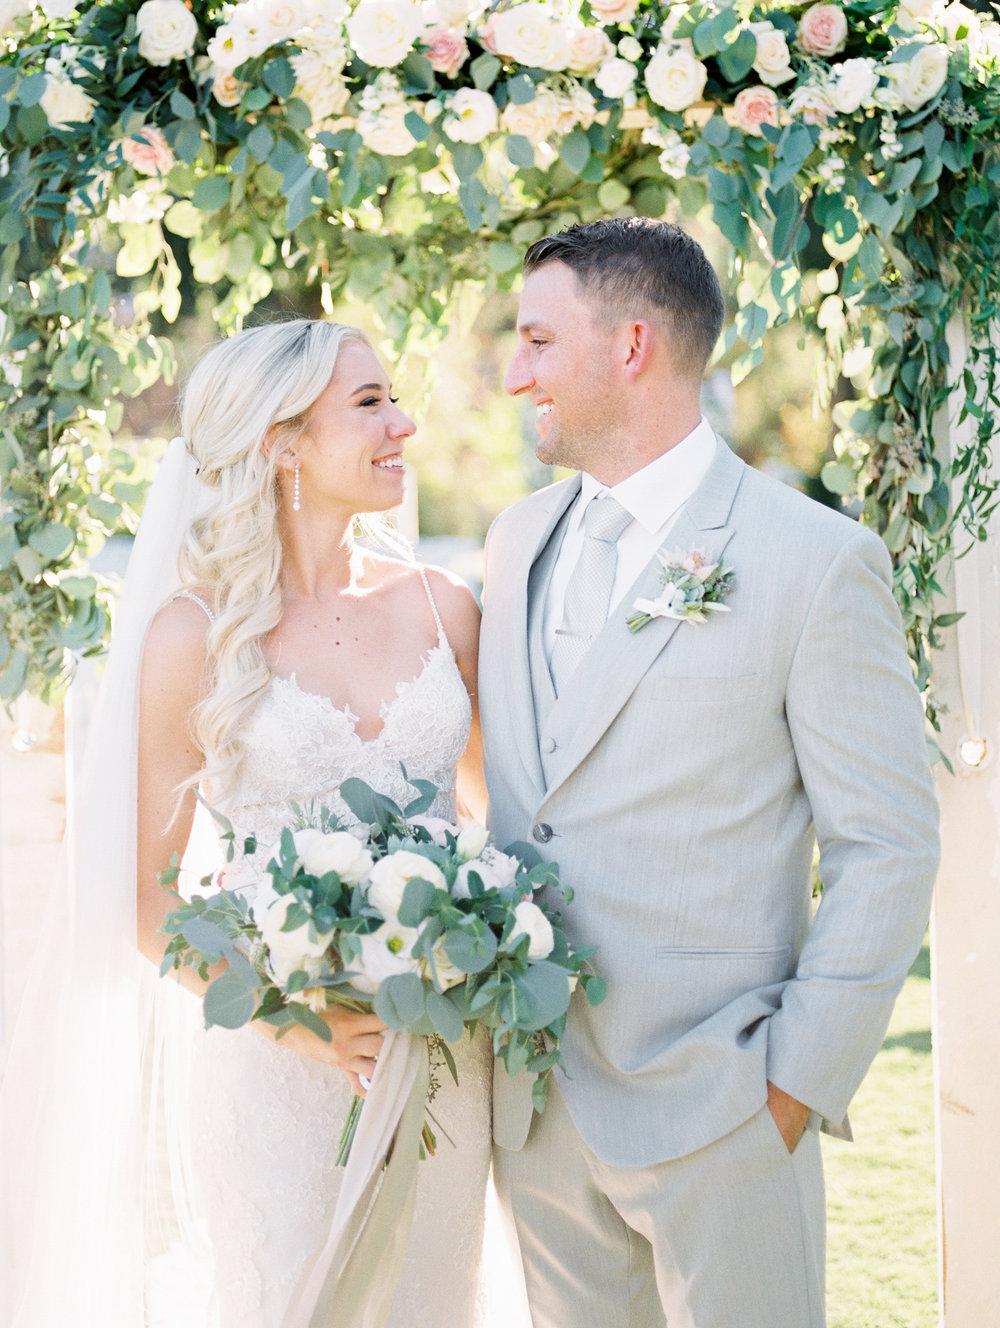 brookview ranch wedding malibu california los angeles wedding photographer